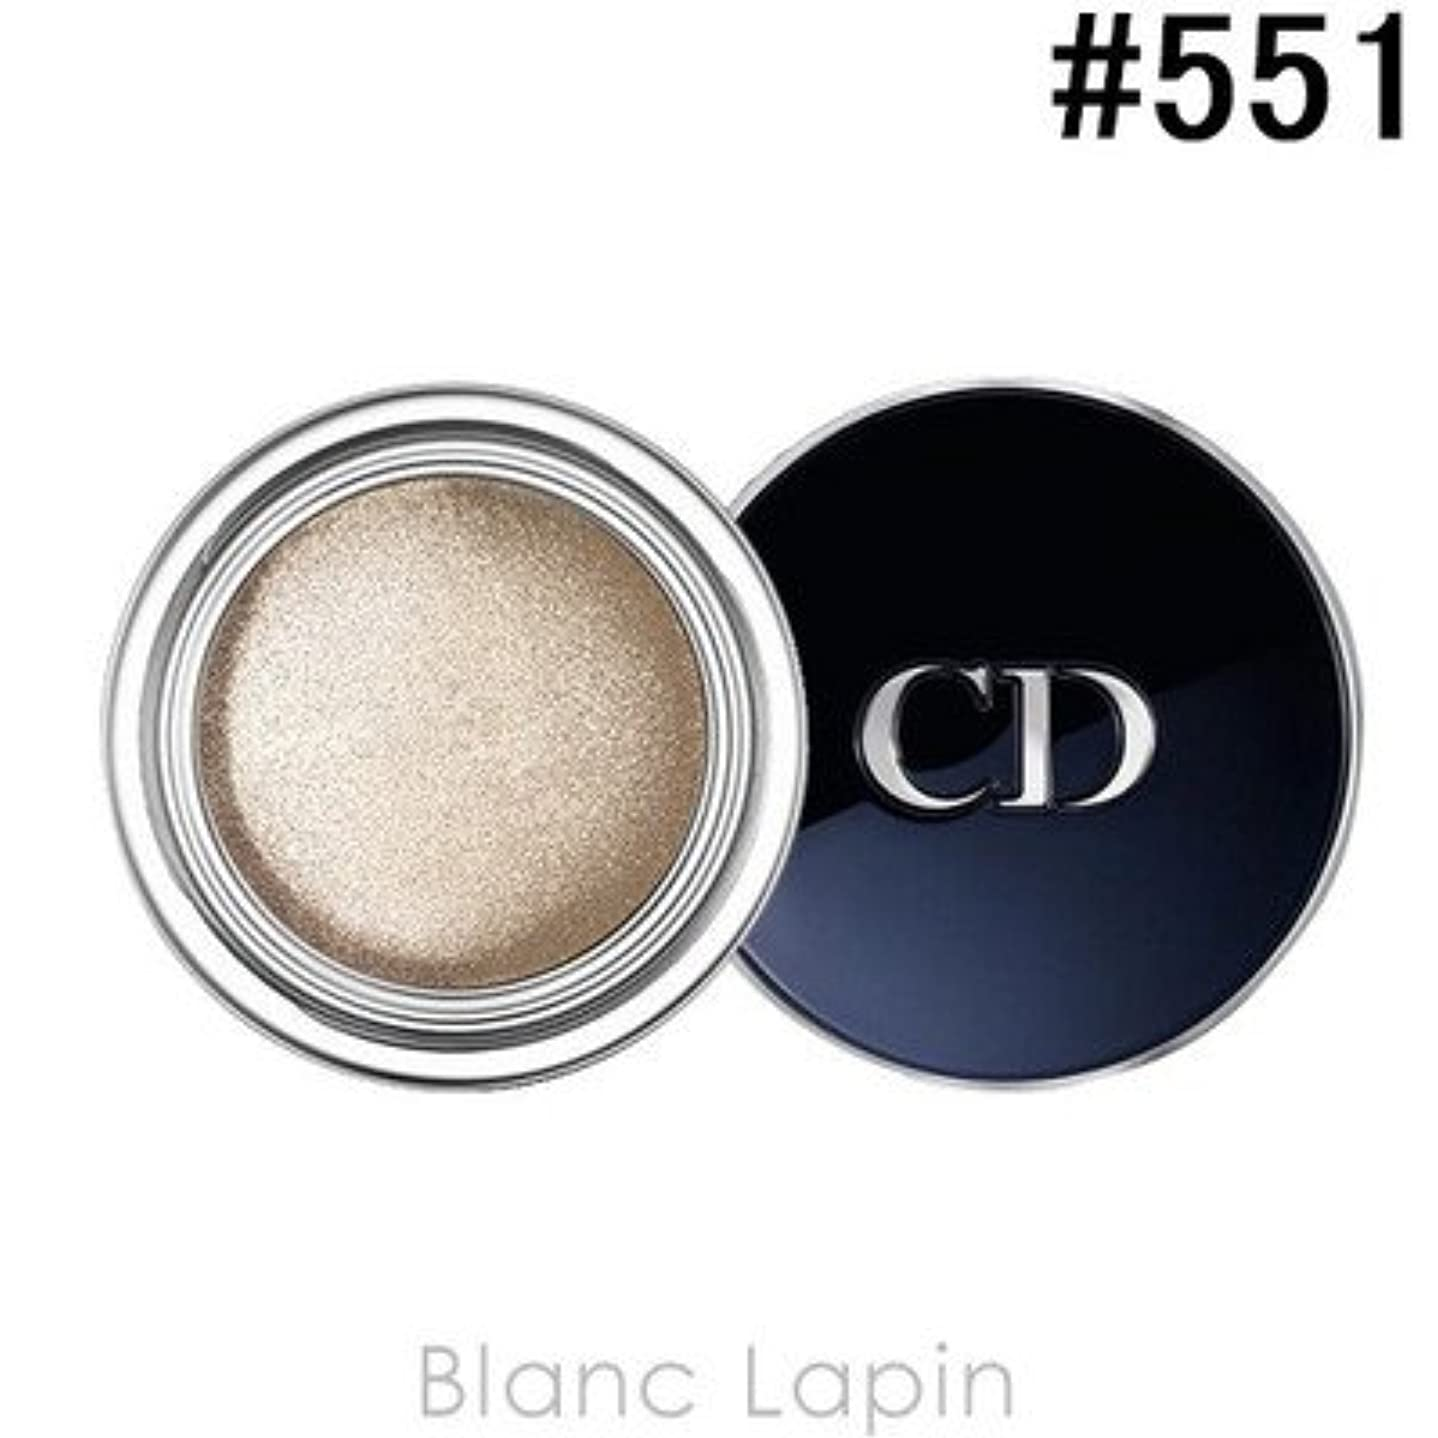 Dior ディオールショウフュージョンモノ #551 ゼニス 6.5g [255691] [並行輸入品]